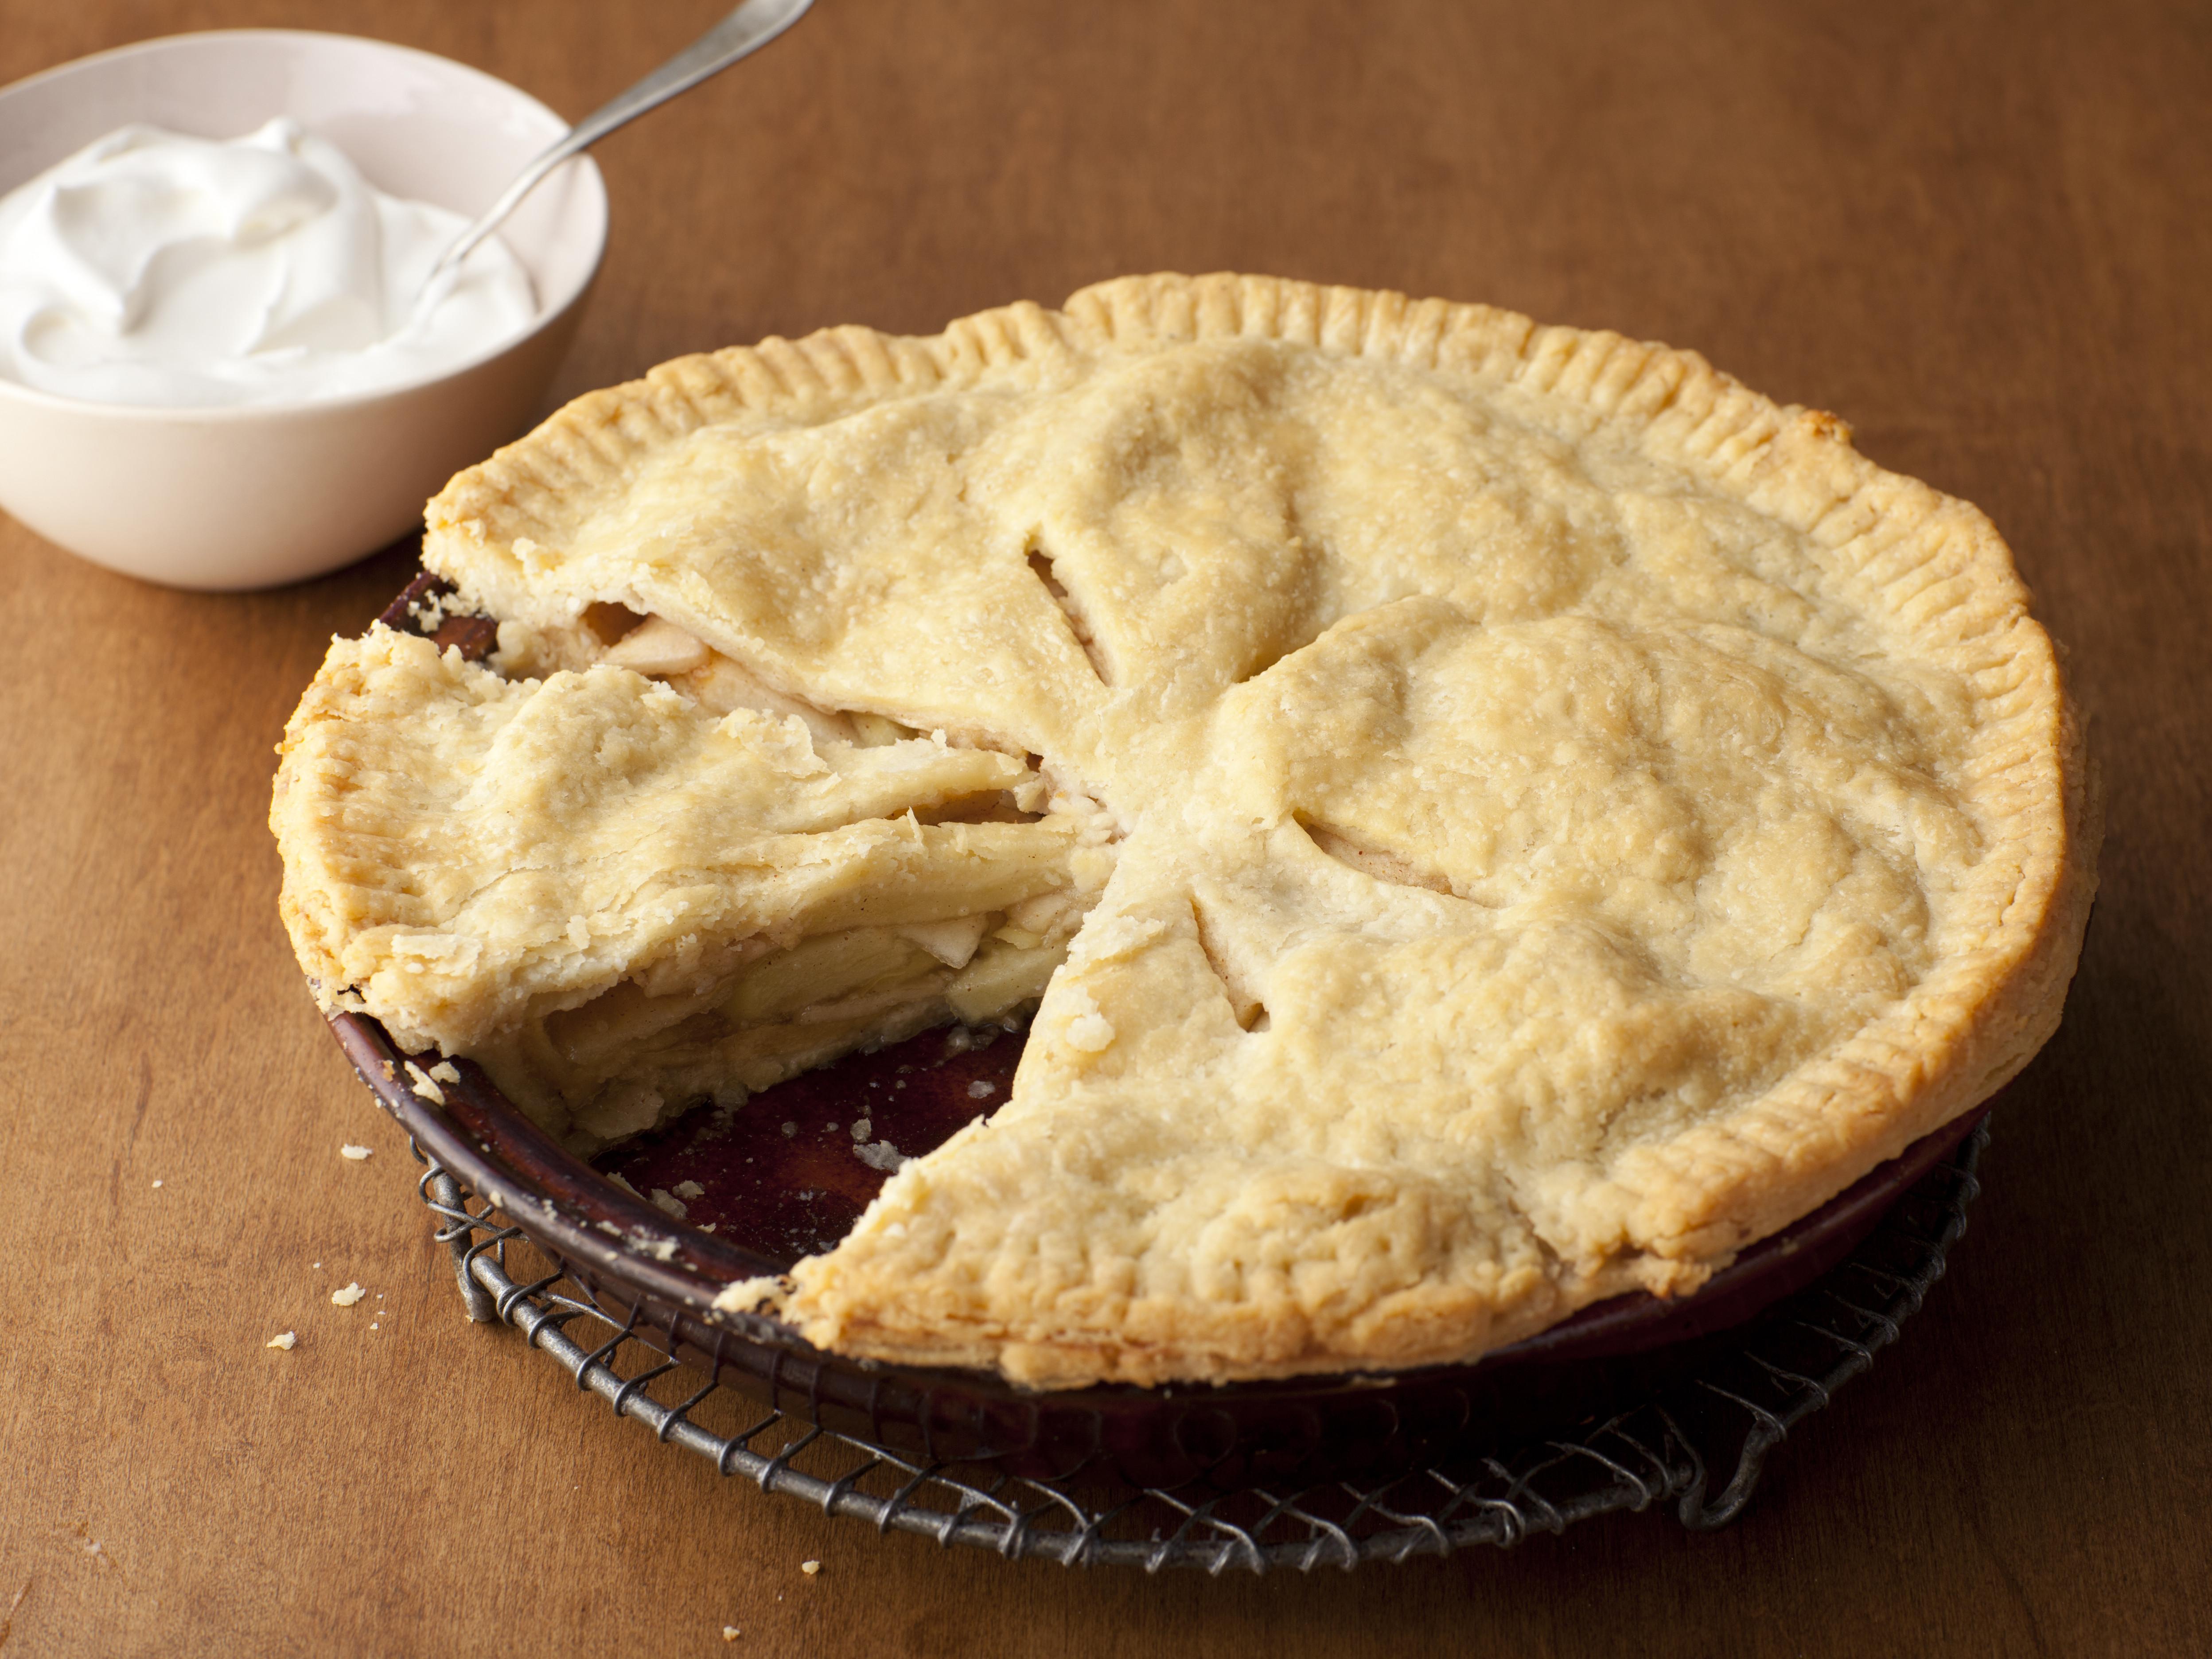 Apple Pie Recipe Food Network  Apple Pie Recipe Bobby Flay Food Network